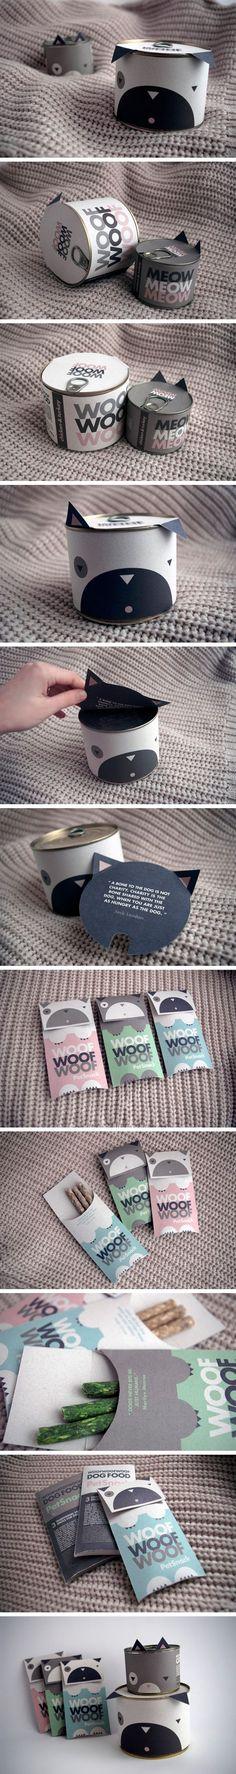 Packaging-Designs-ideas 20